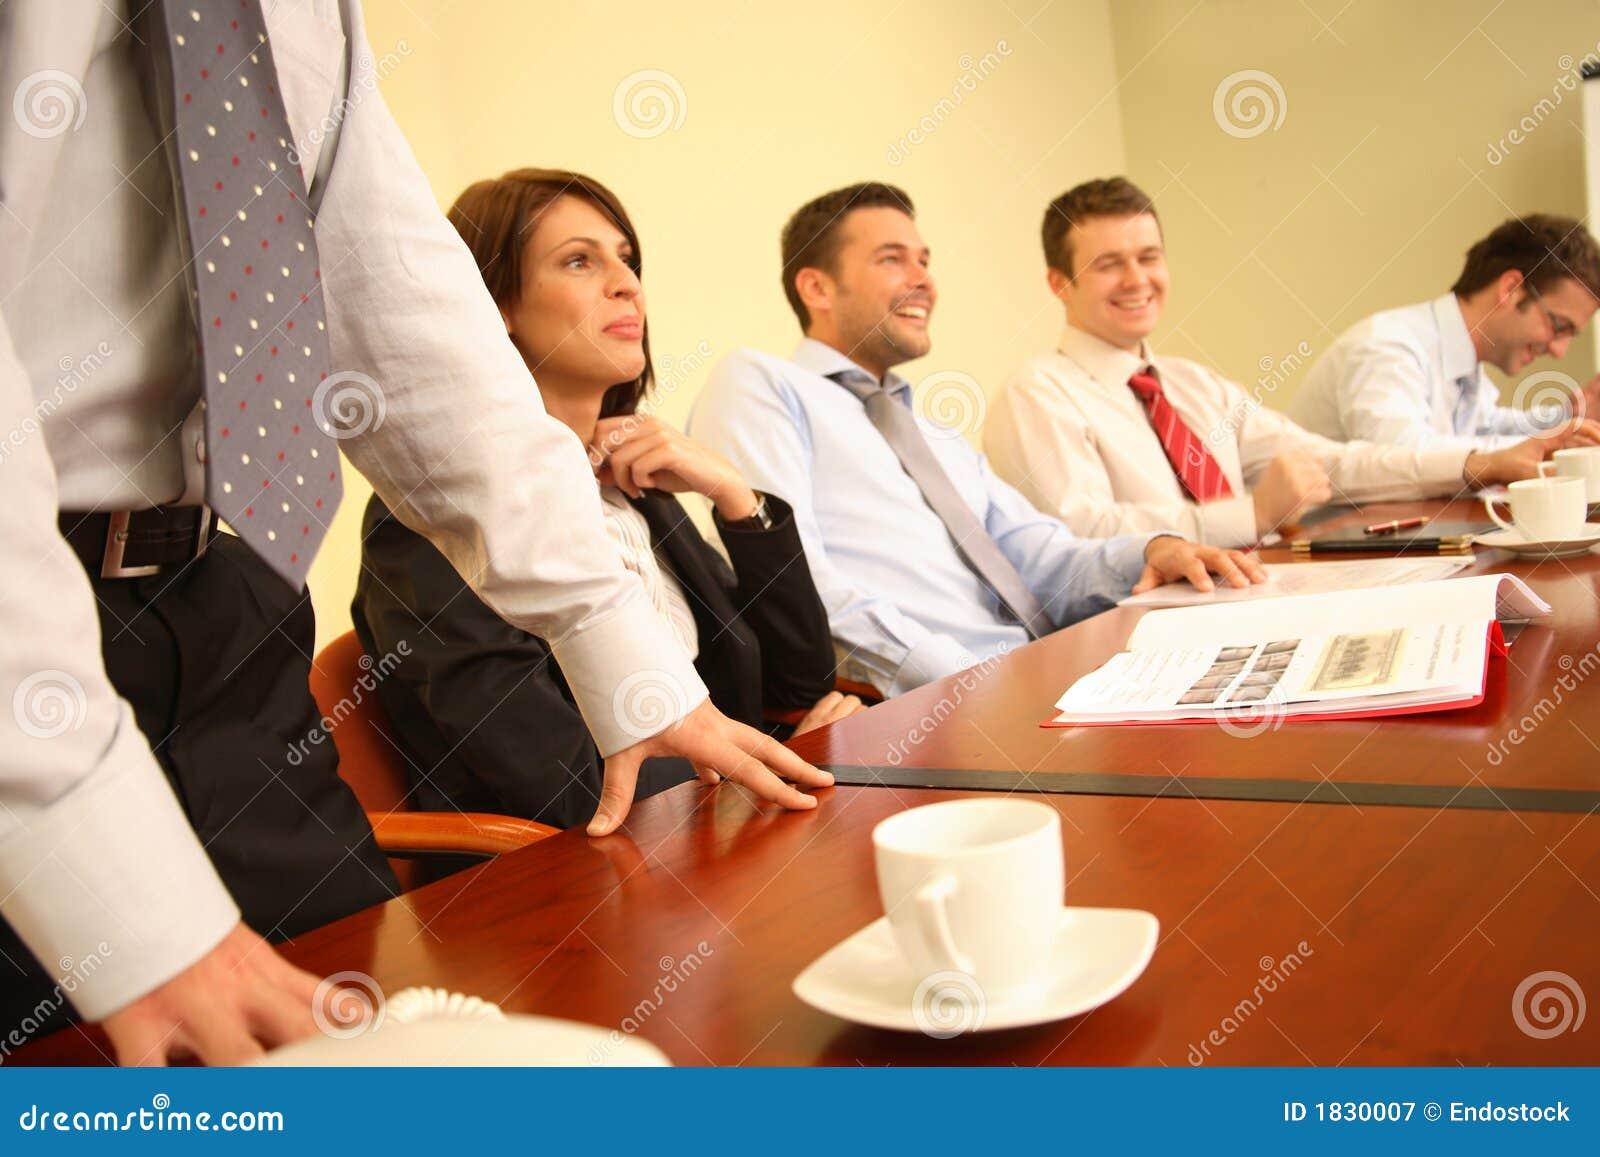 Group Of People Having Fun During Informal Business